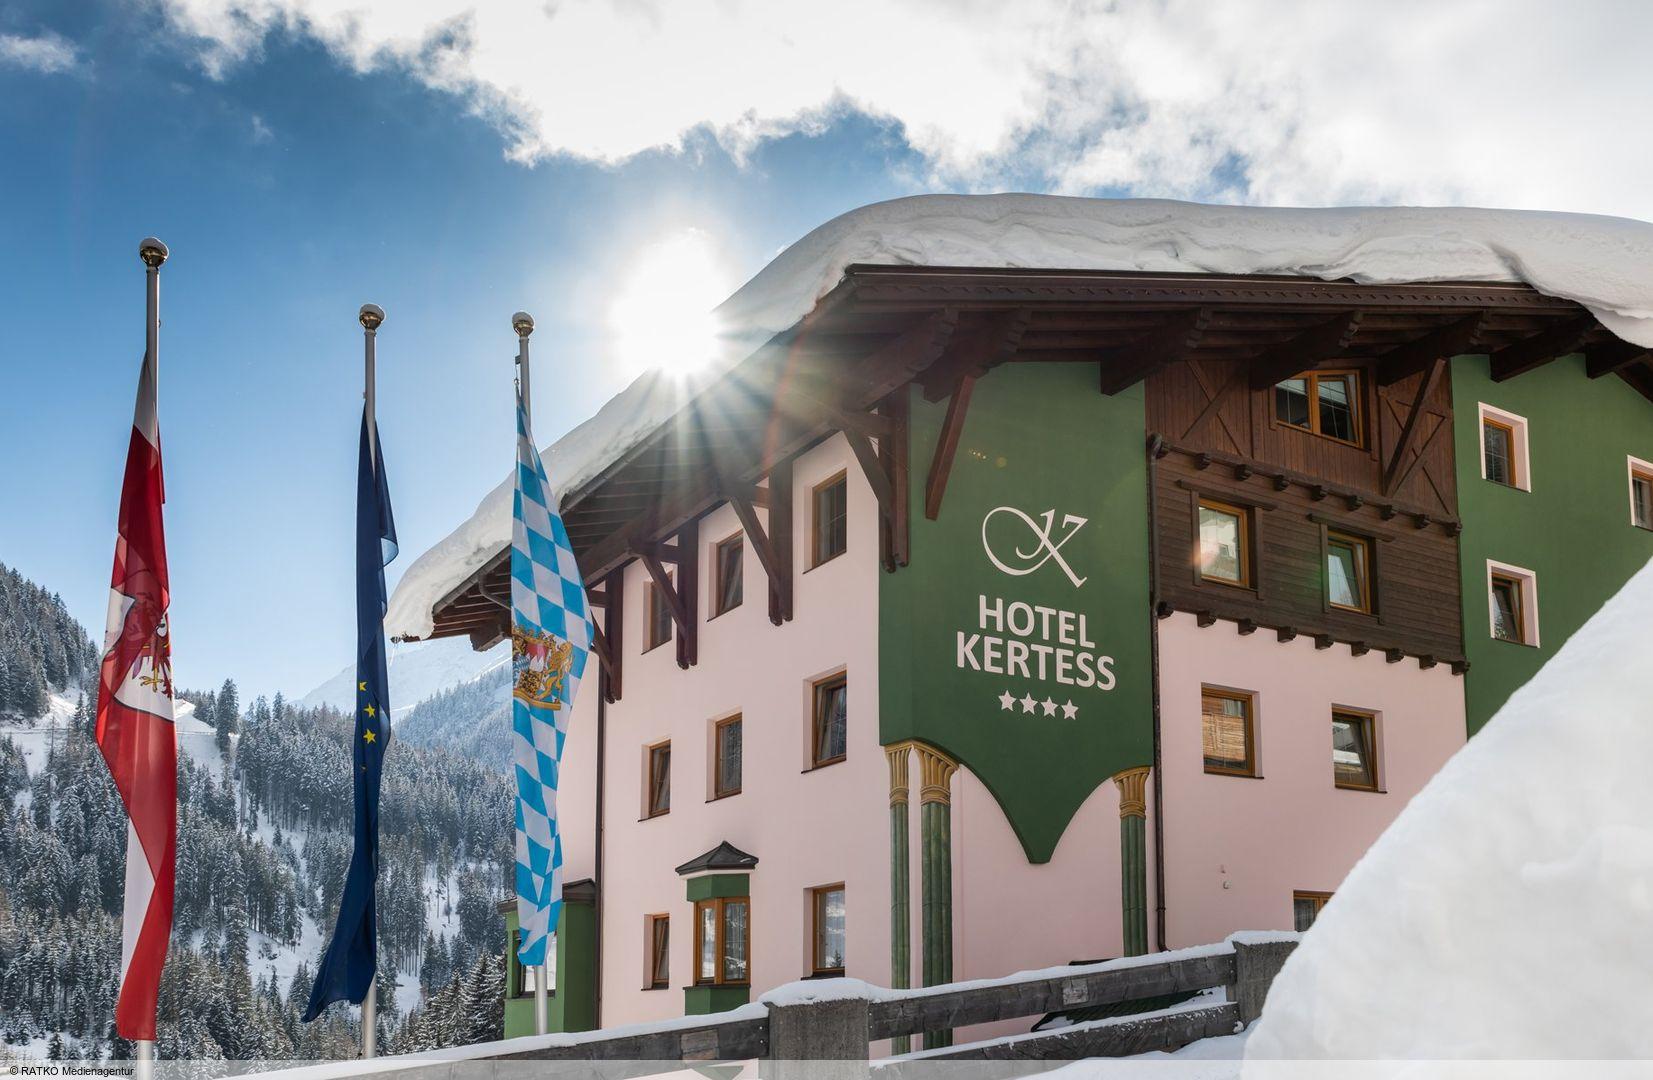 Slide1 - Hotel Kertess